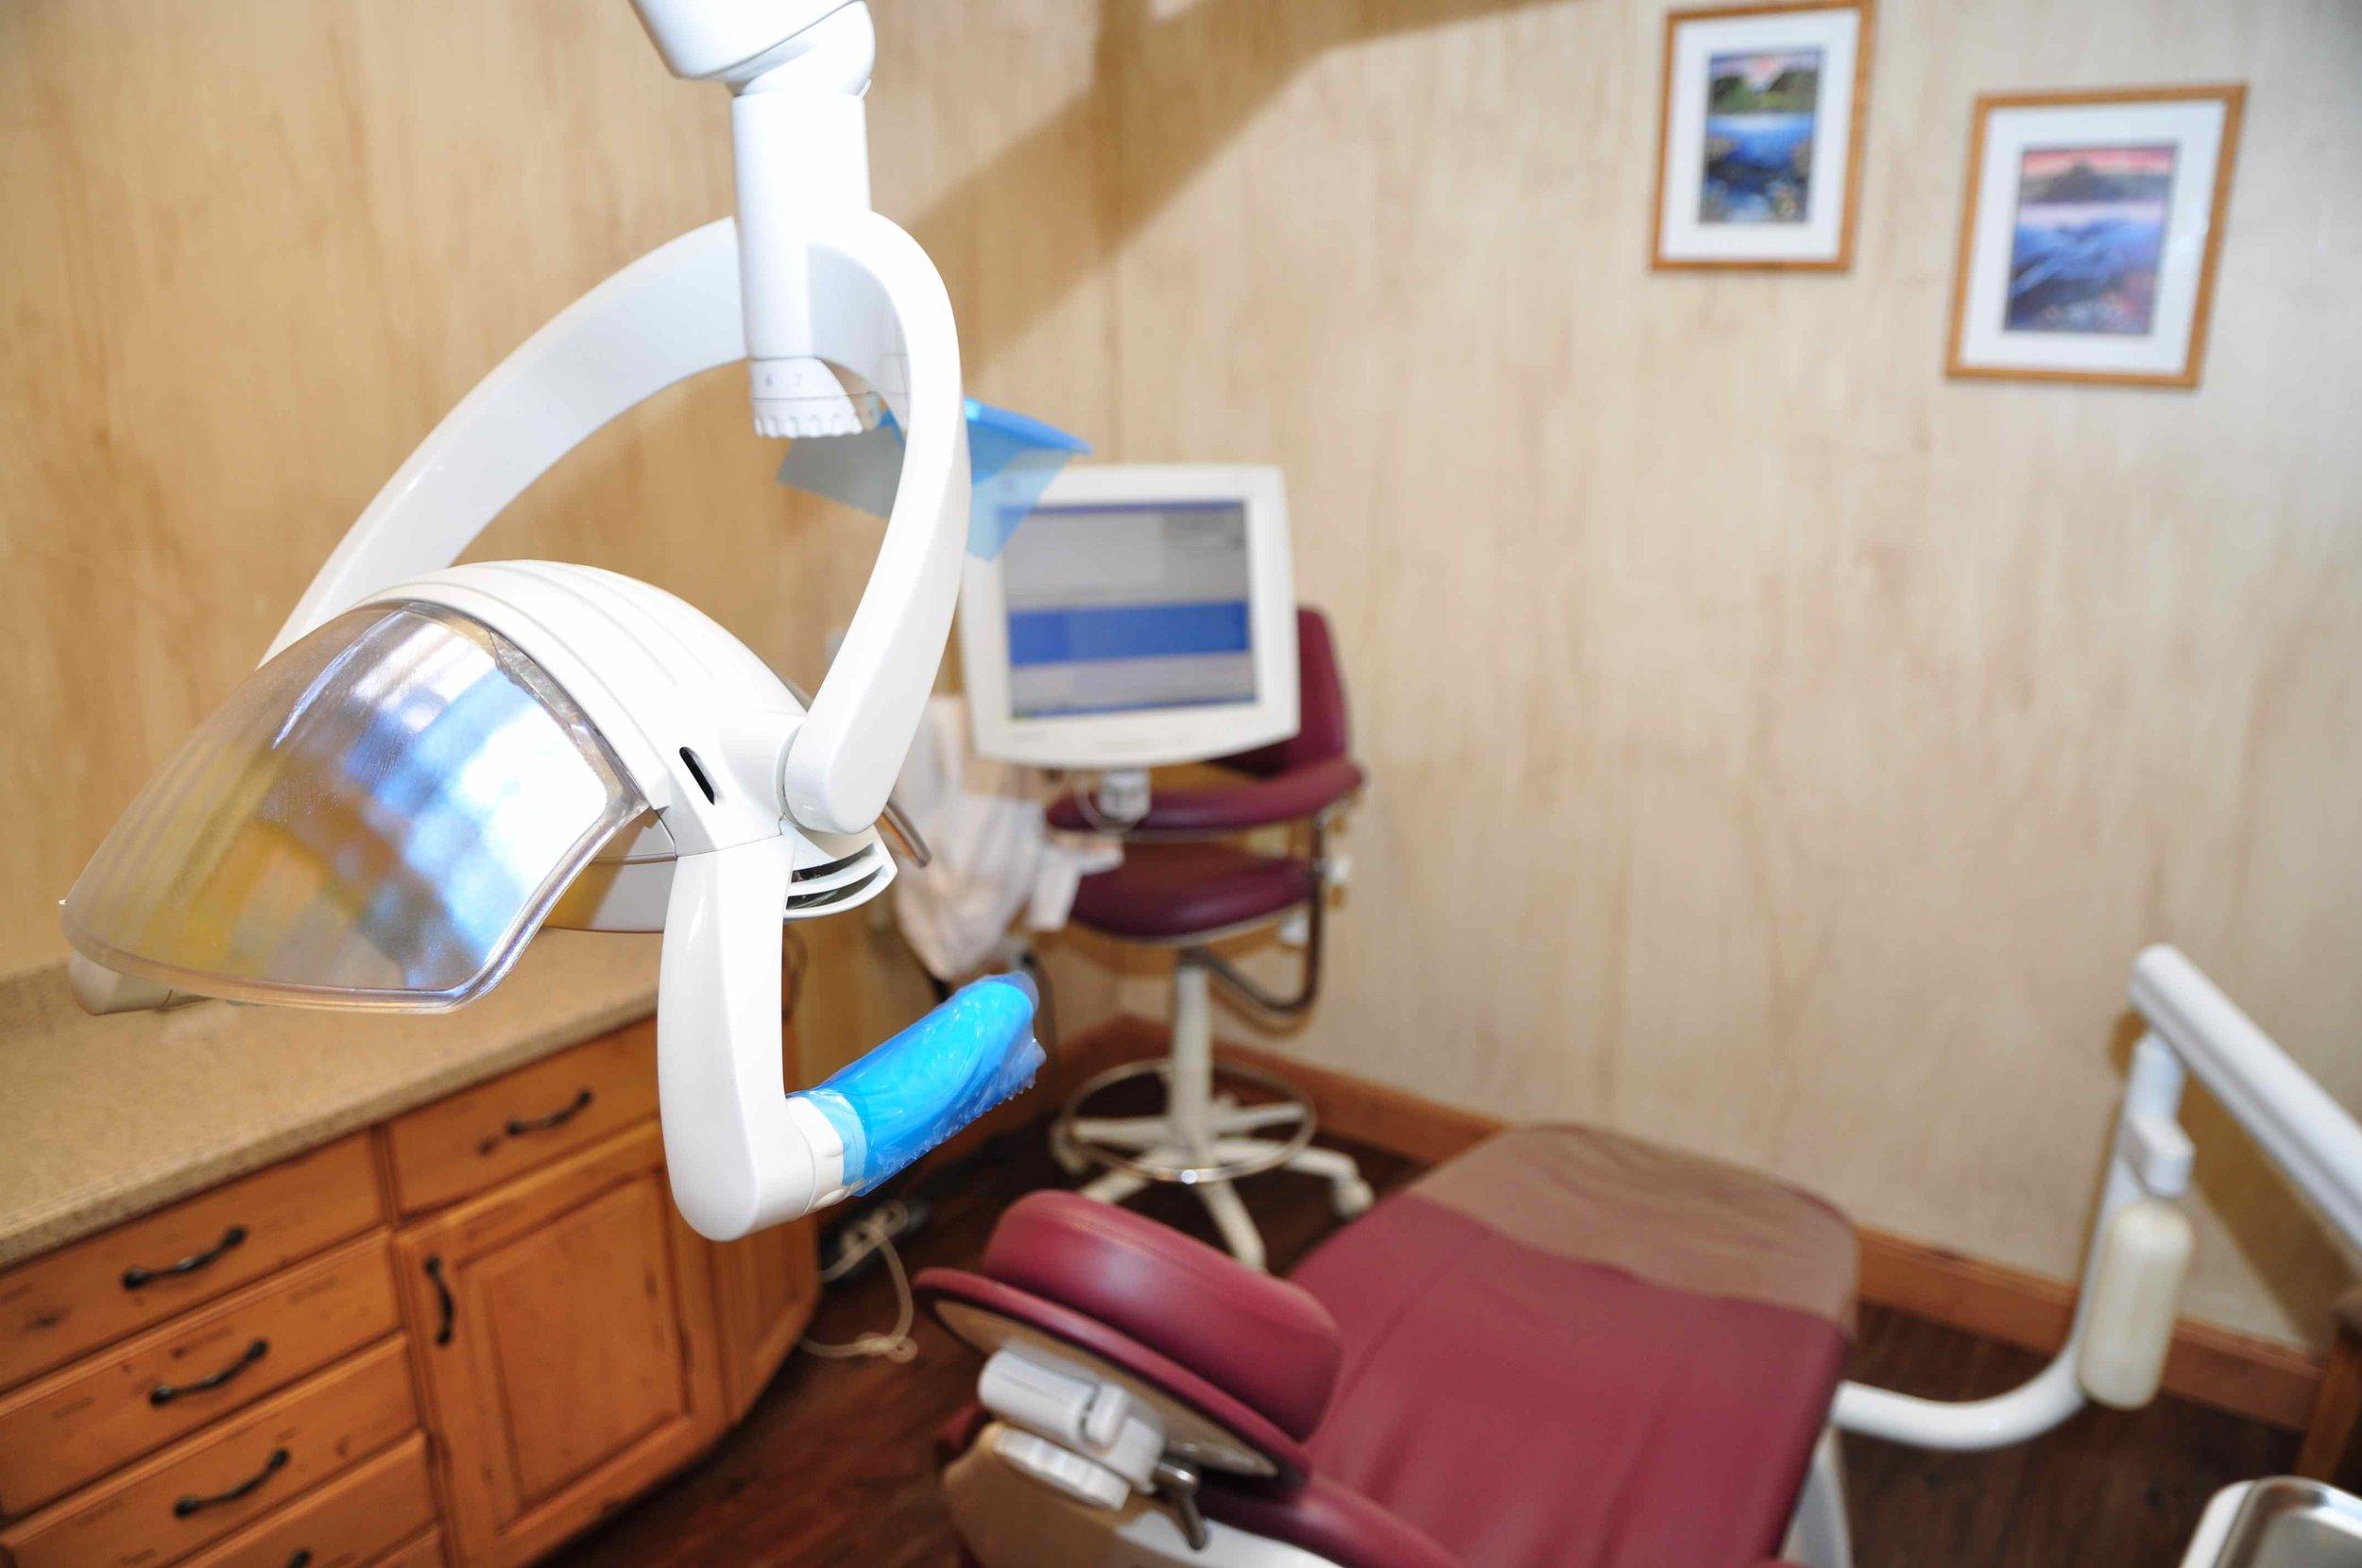 Operatory room at Cornerstone Dental Care